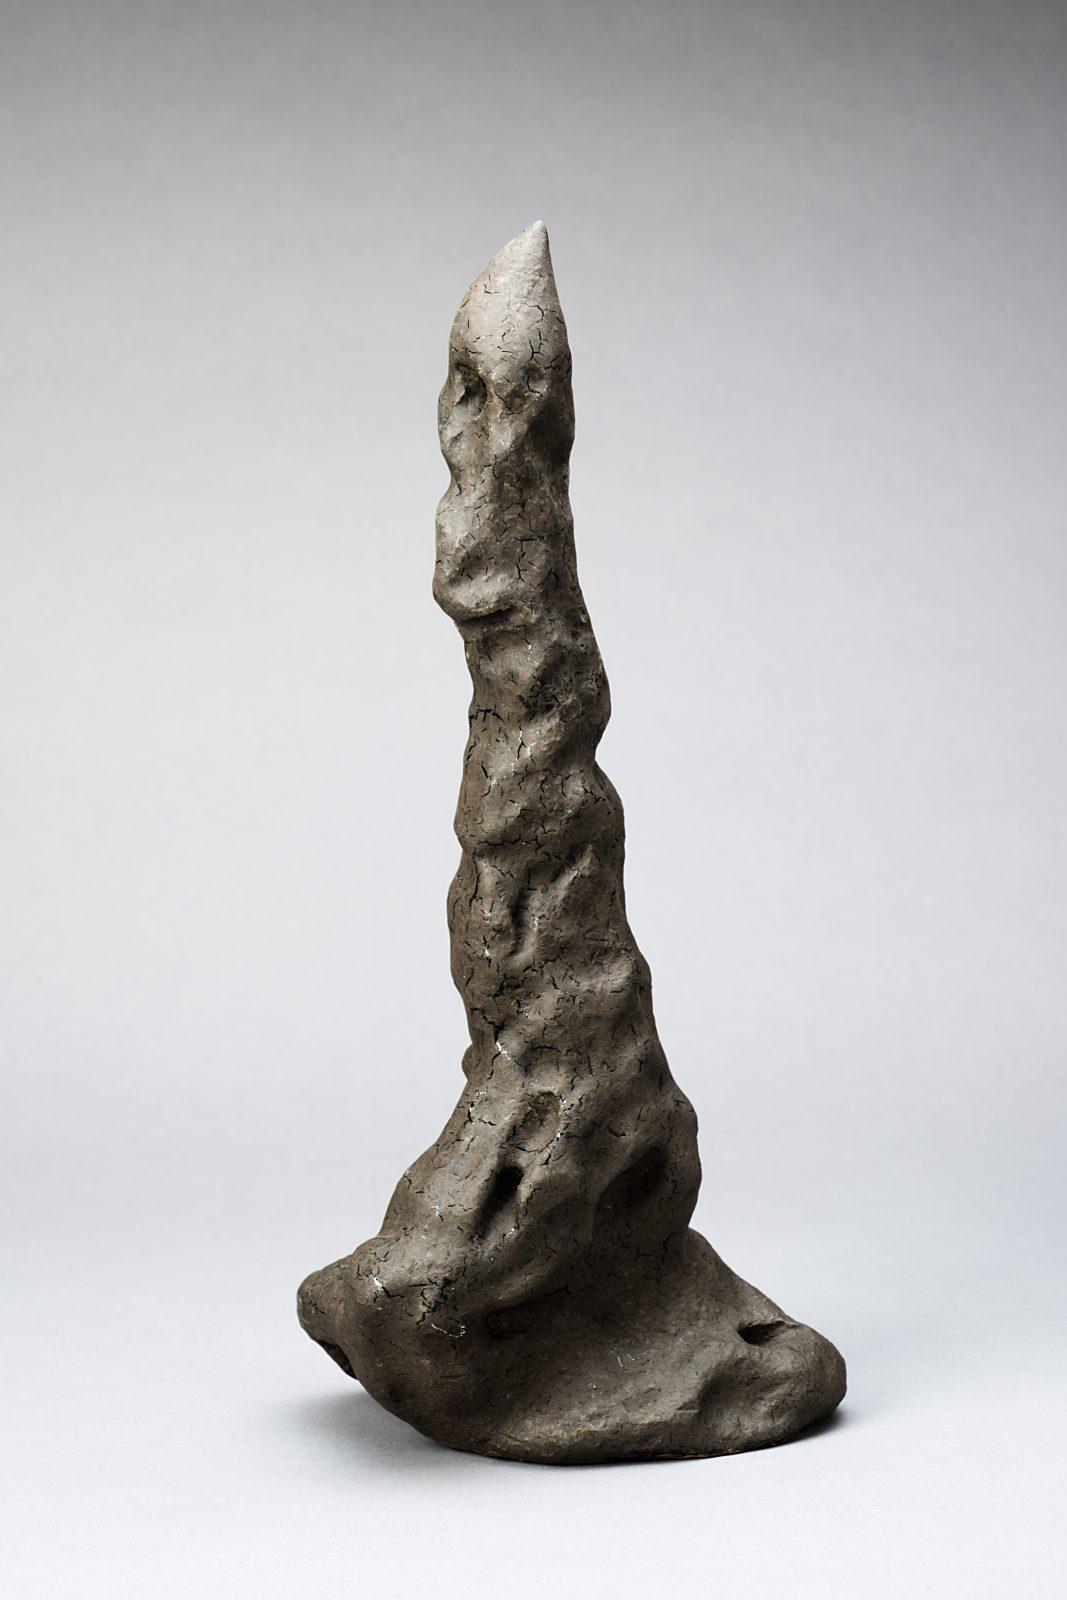 Klaus Lehmann –Serendip IV –2014, 33x18x13cm –Galerie Metzger Gallery Johannesberg Nachlass-Verwaltung Kunst Plastik Sculpture Art Ceramics